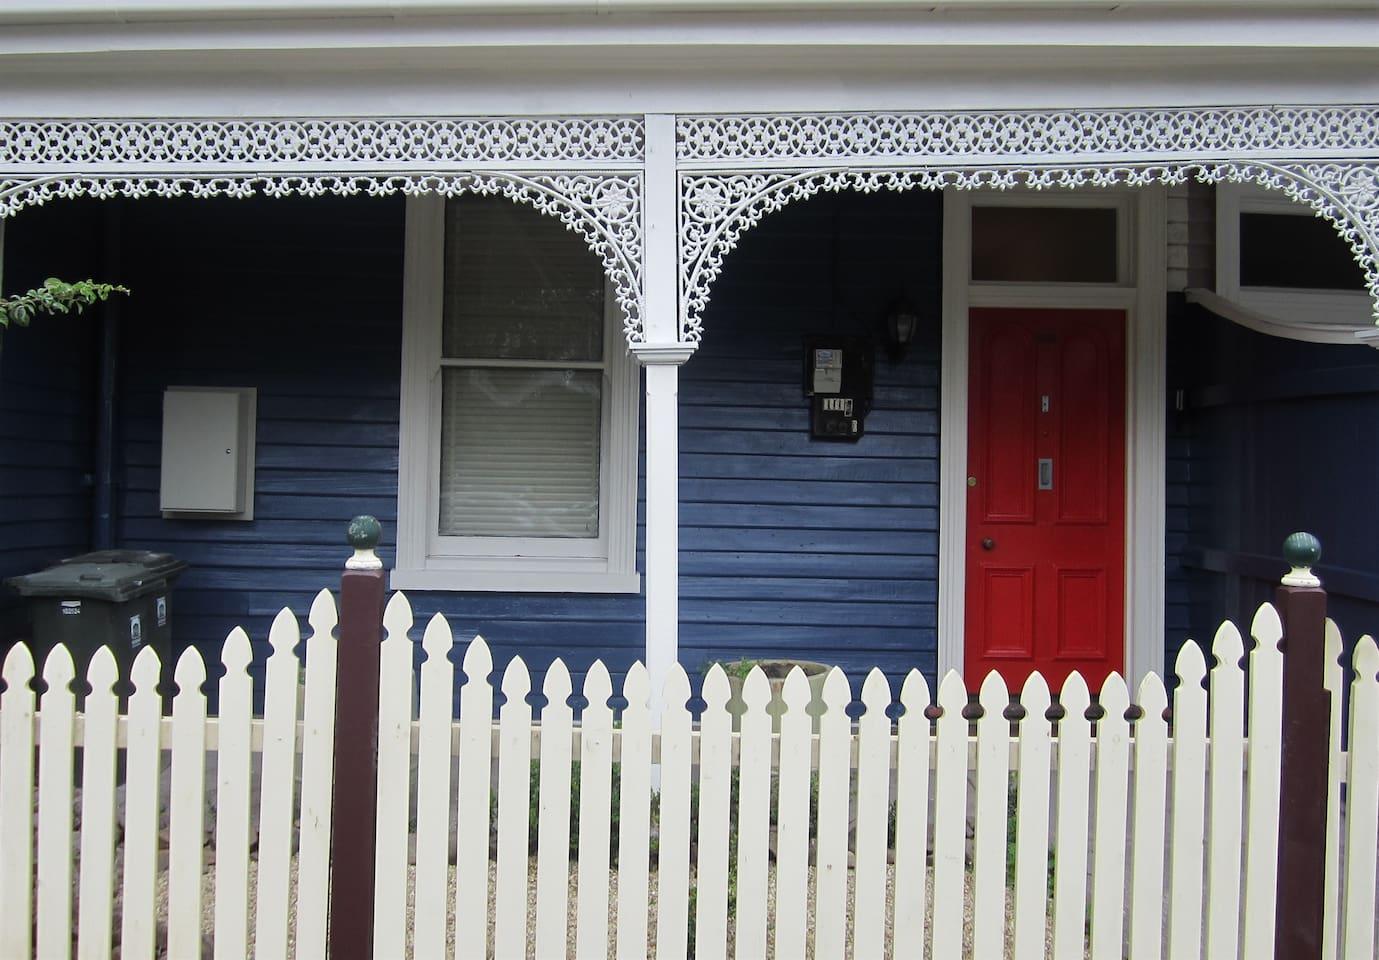 Enter through the Red Door.